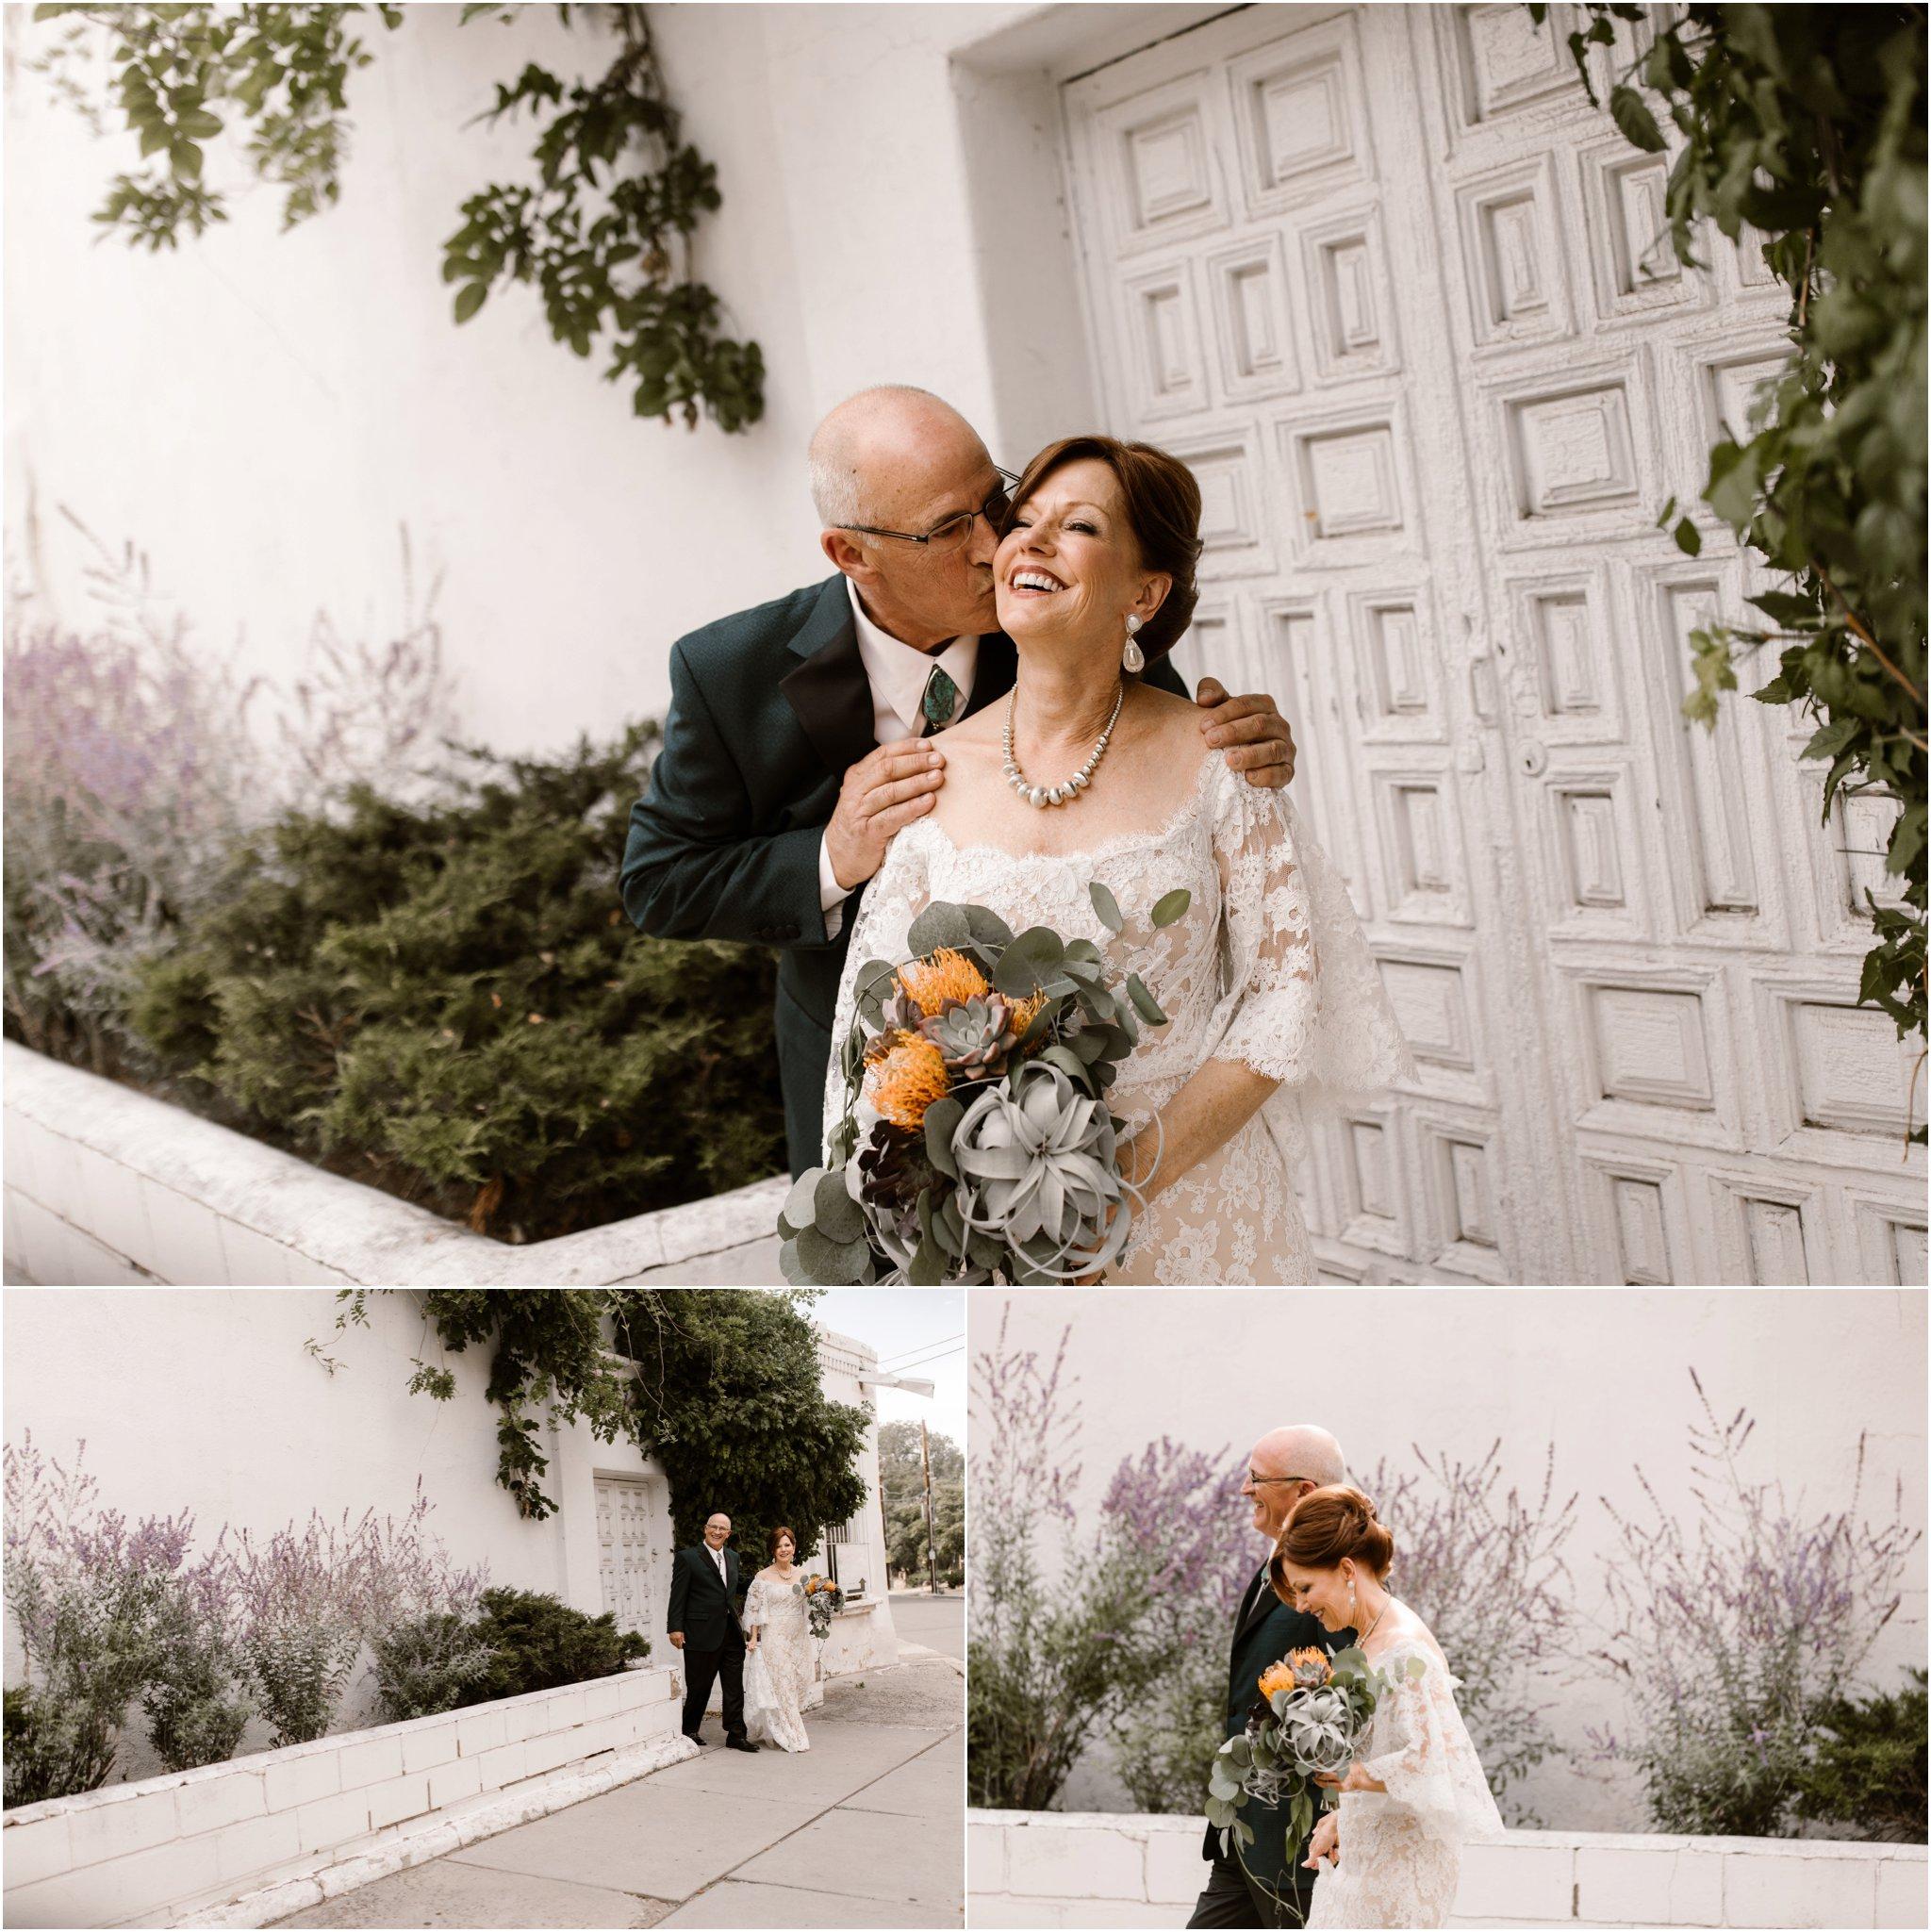 0020Santa Fe Wedding _Inn and Spa at Loretto Wedding, Inn and Spa at Loretto wedding, Santa Fe wedding photographers, blue rose photography